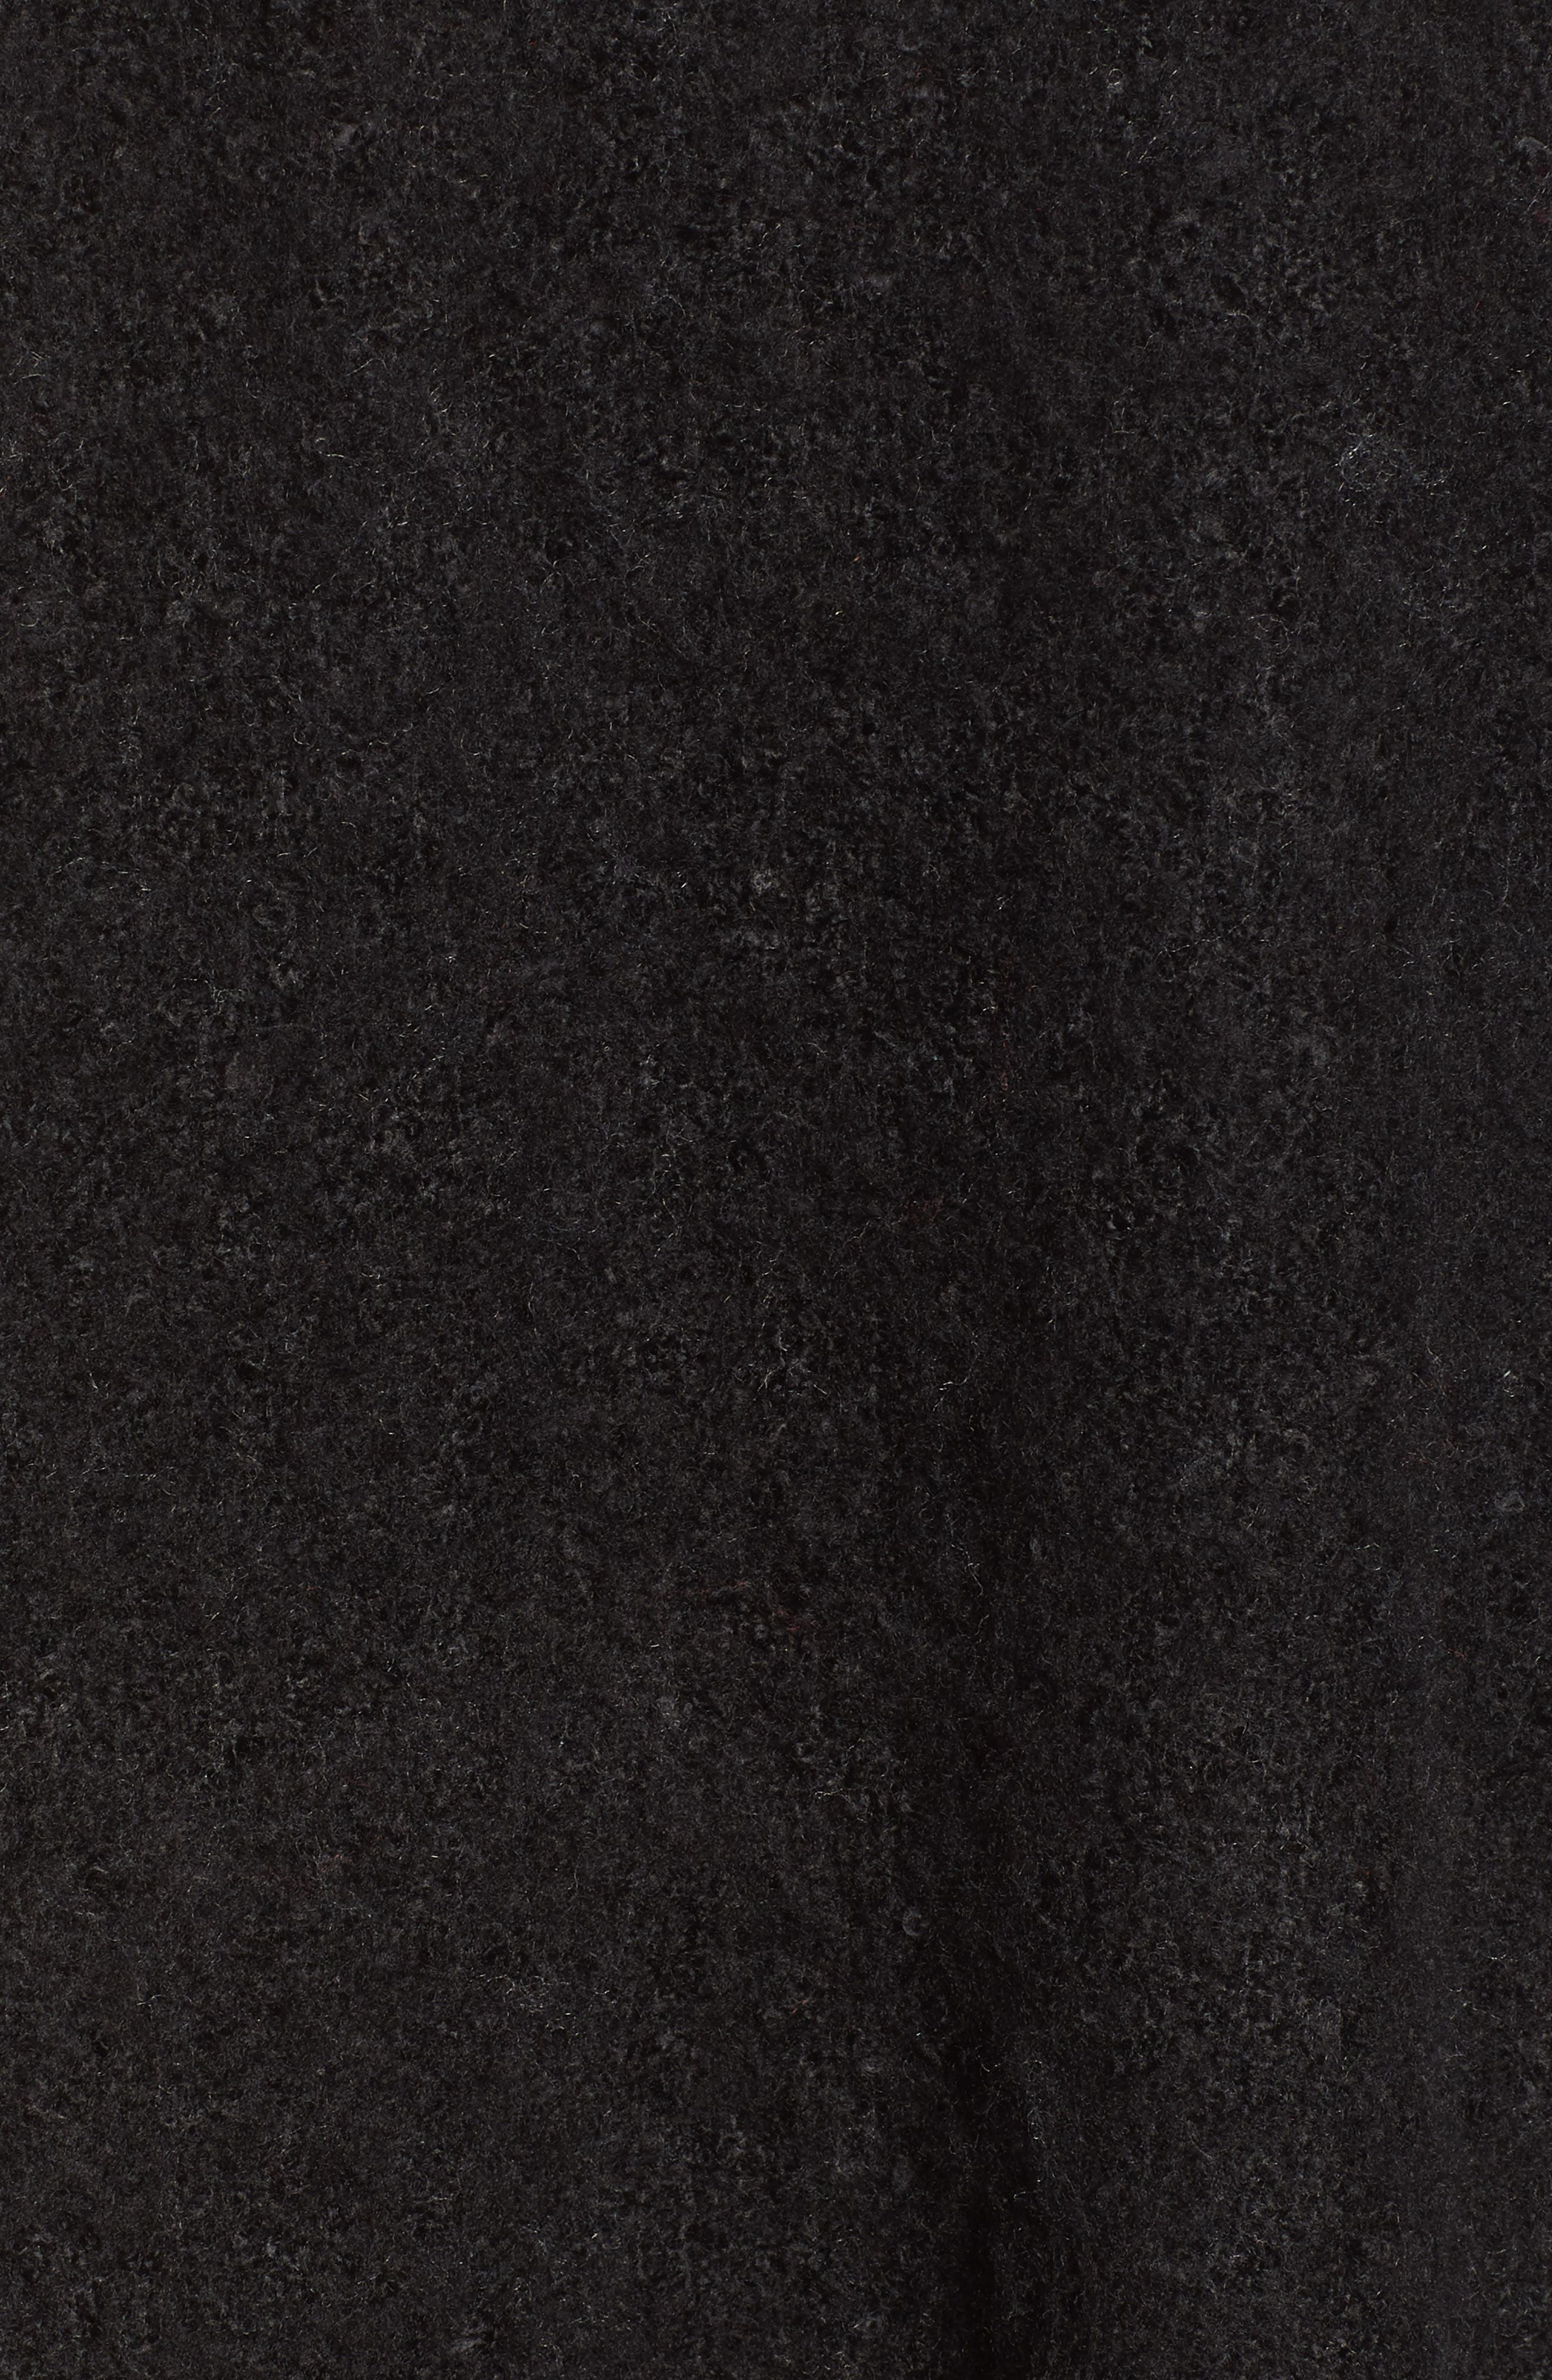 Madison Fringed Wrap,                             Alternate thumbnail 5, color,                             BLACK